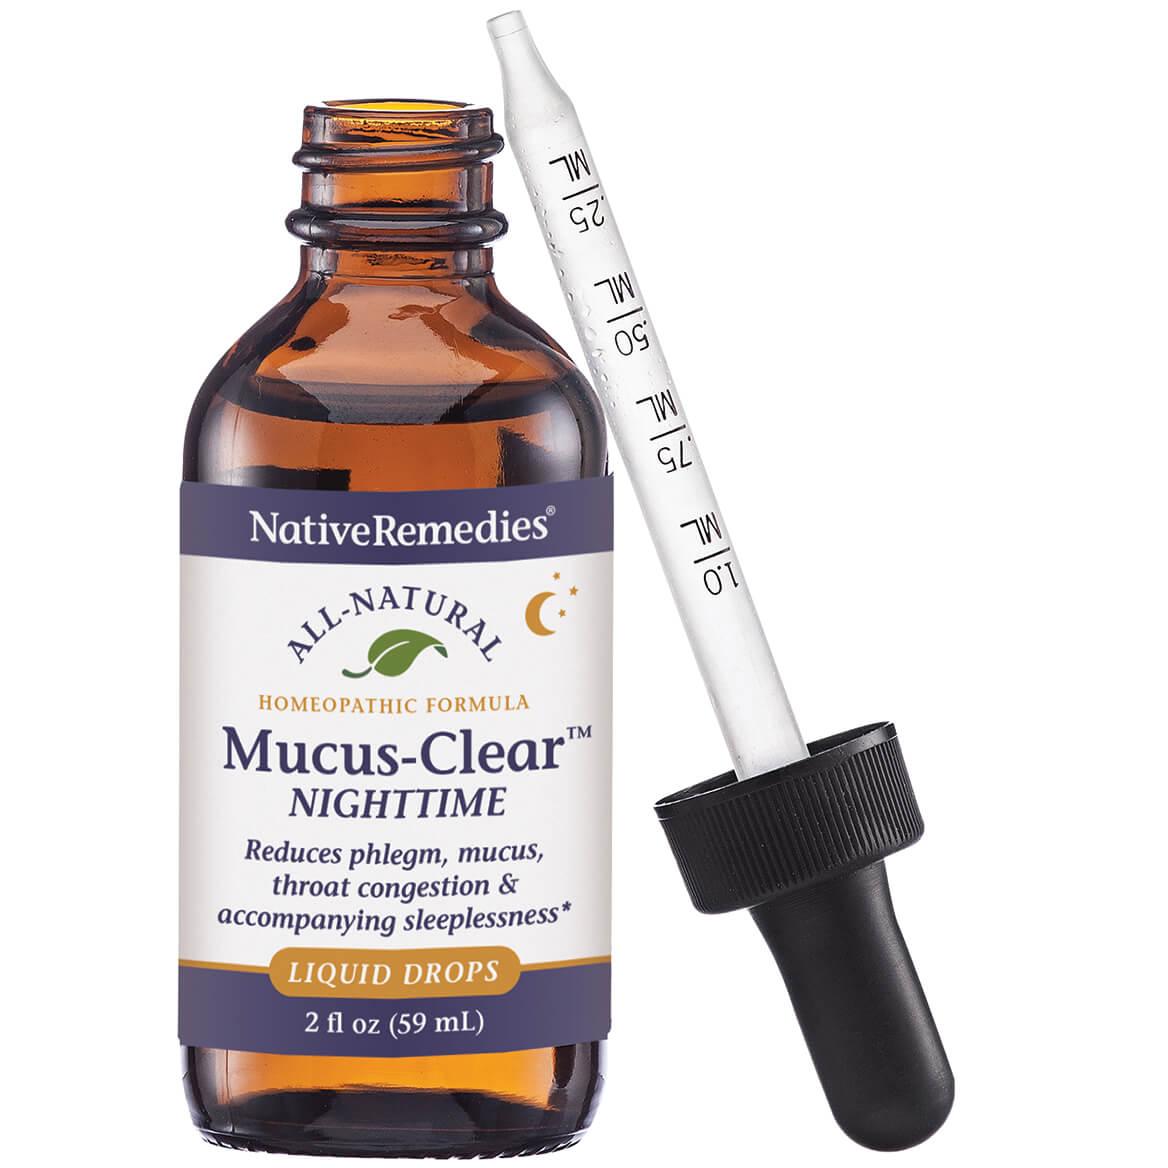 NativeRemedies® Mucus-Clear™ Nighttime-367338